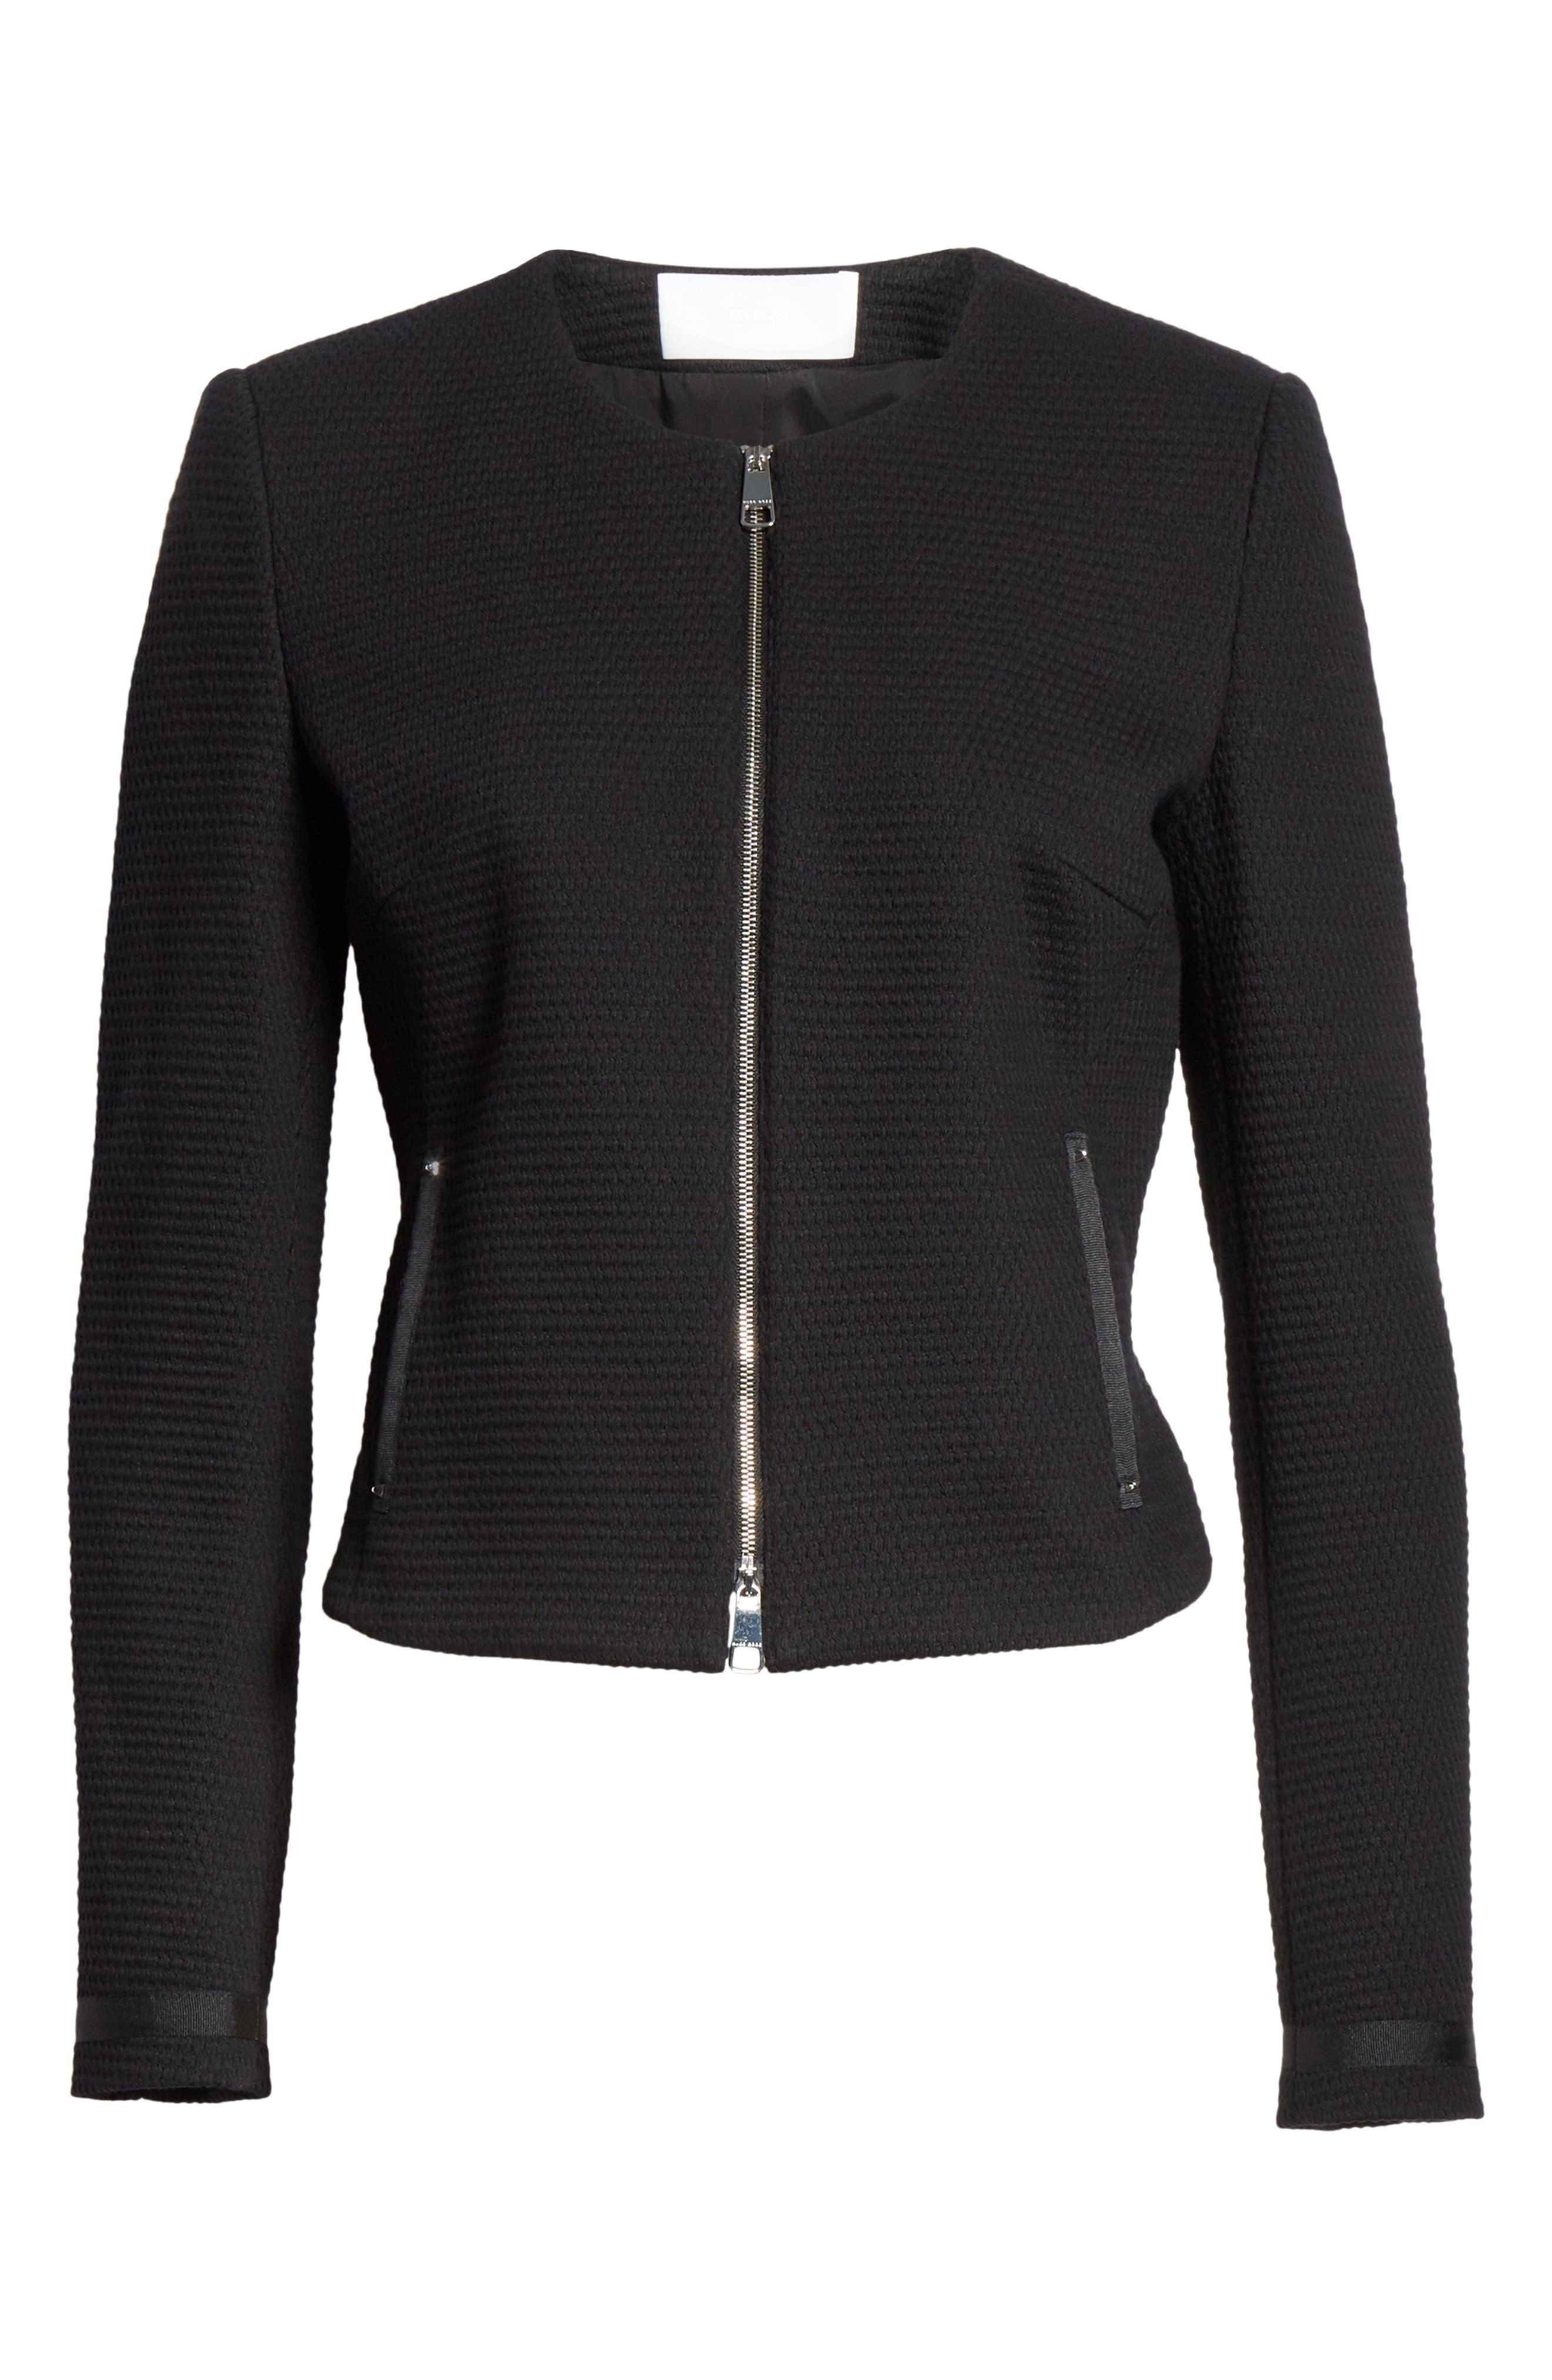 Kemio Textured Jersey Suit Jacket,                             Alternate thumbnail 5, color,                             BLACK